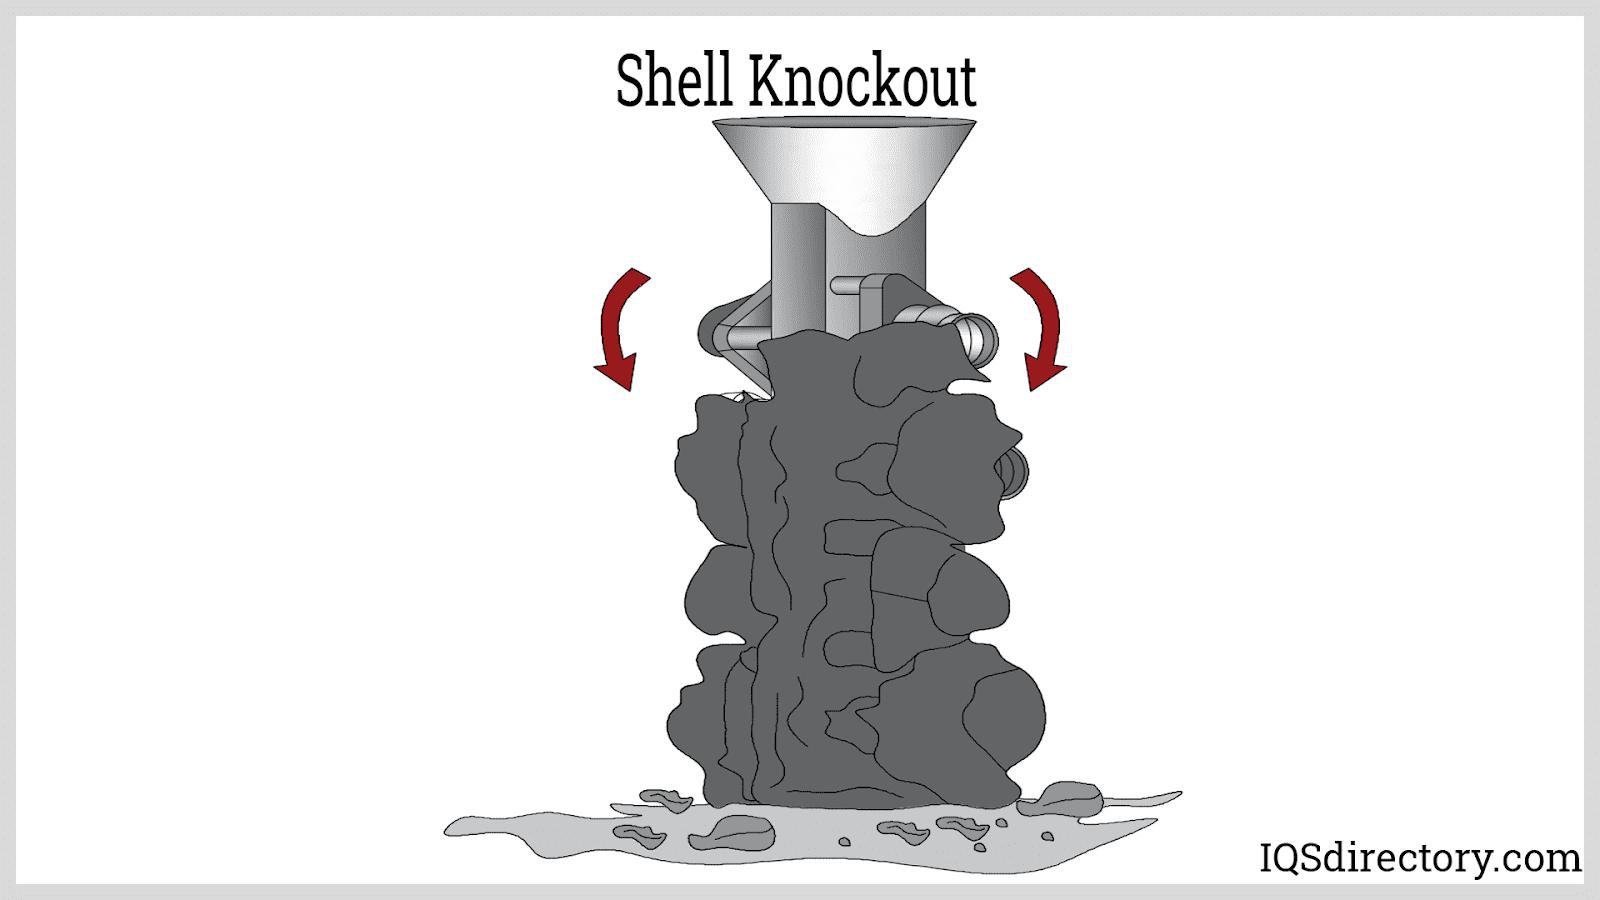 Shell Knockout